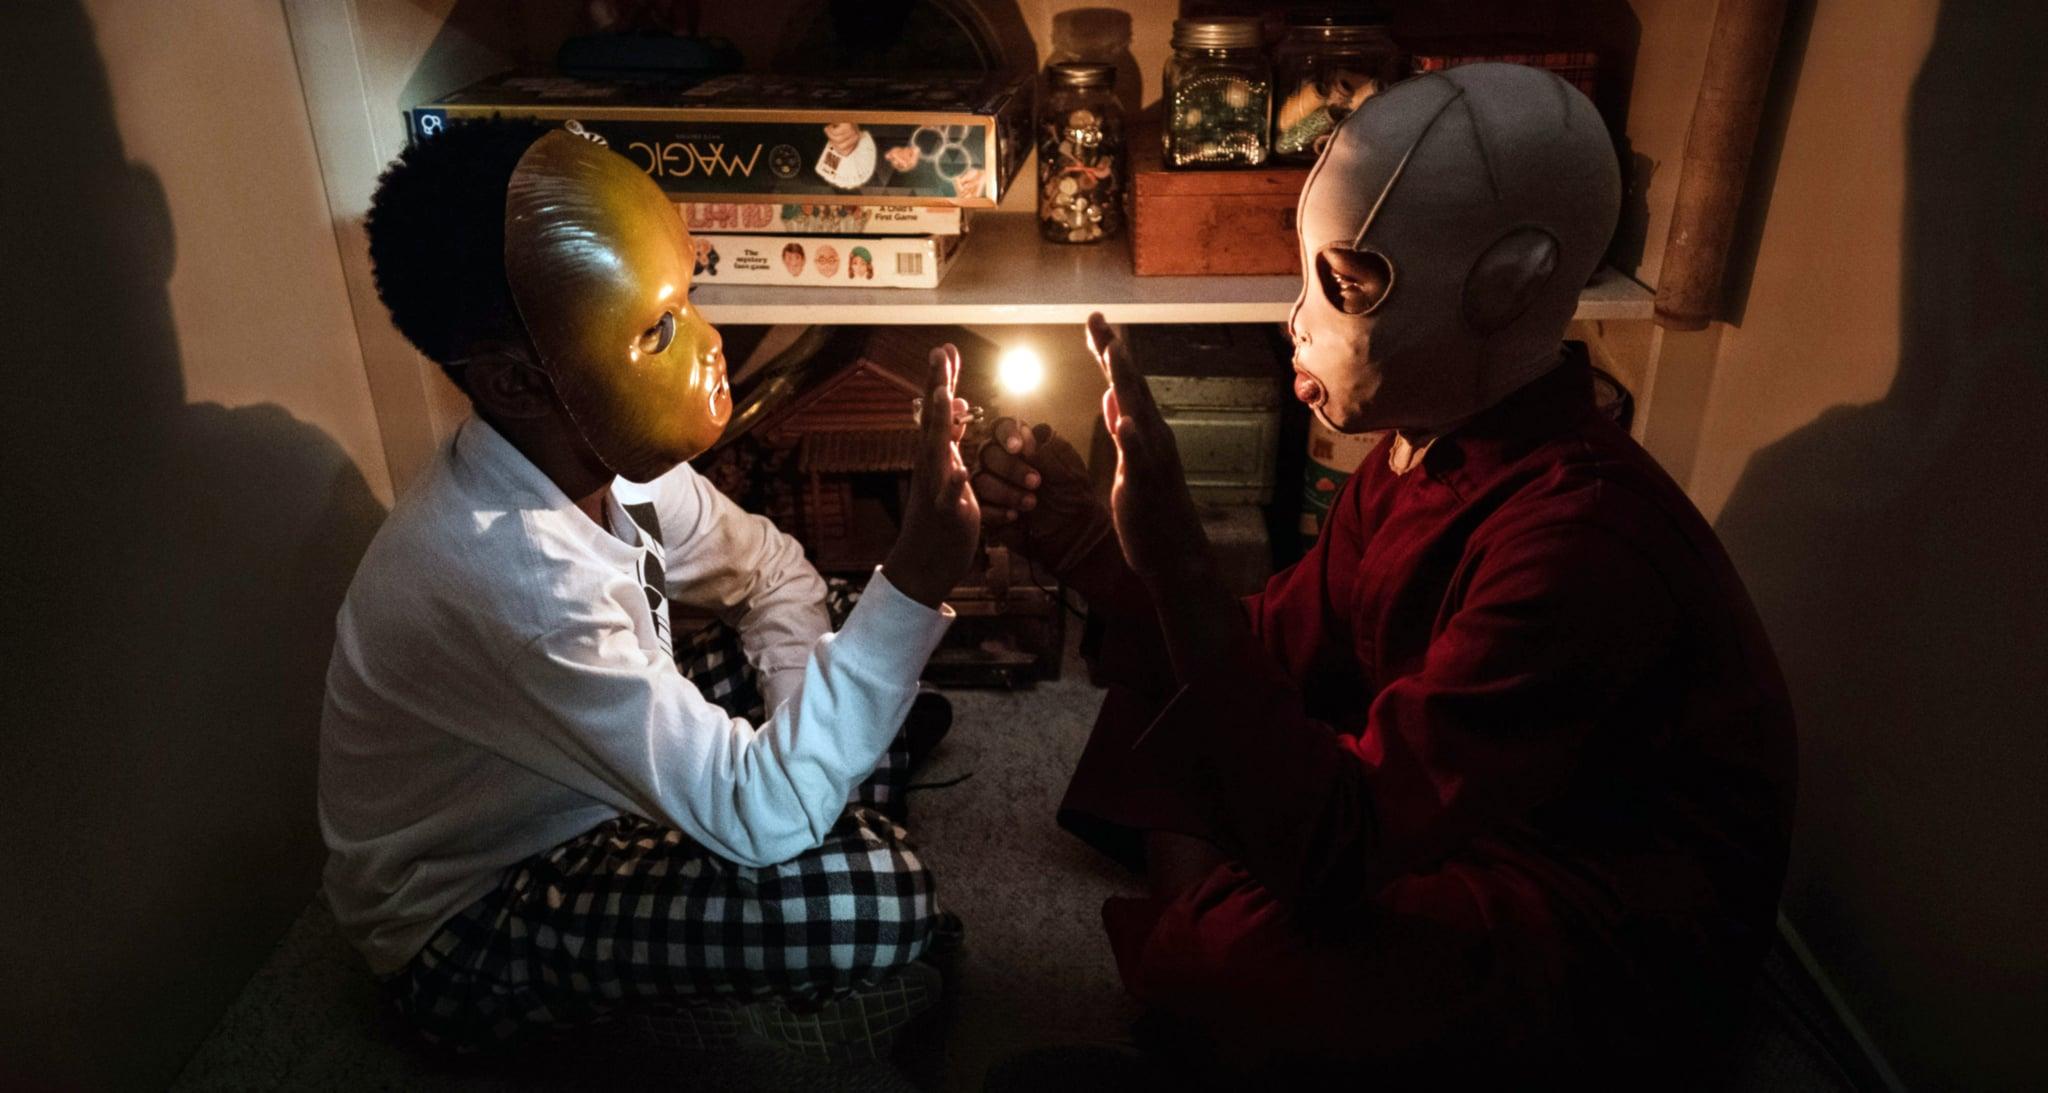 US, Evan Alex as both Jason Wilson and his doppelganger, 2019. ph: Claudette Barius /  Universal / courtesy Everett Collection